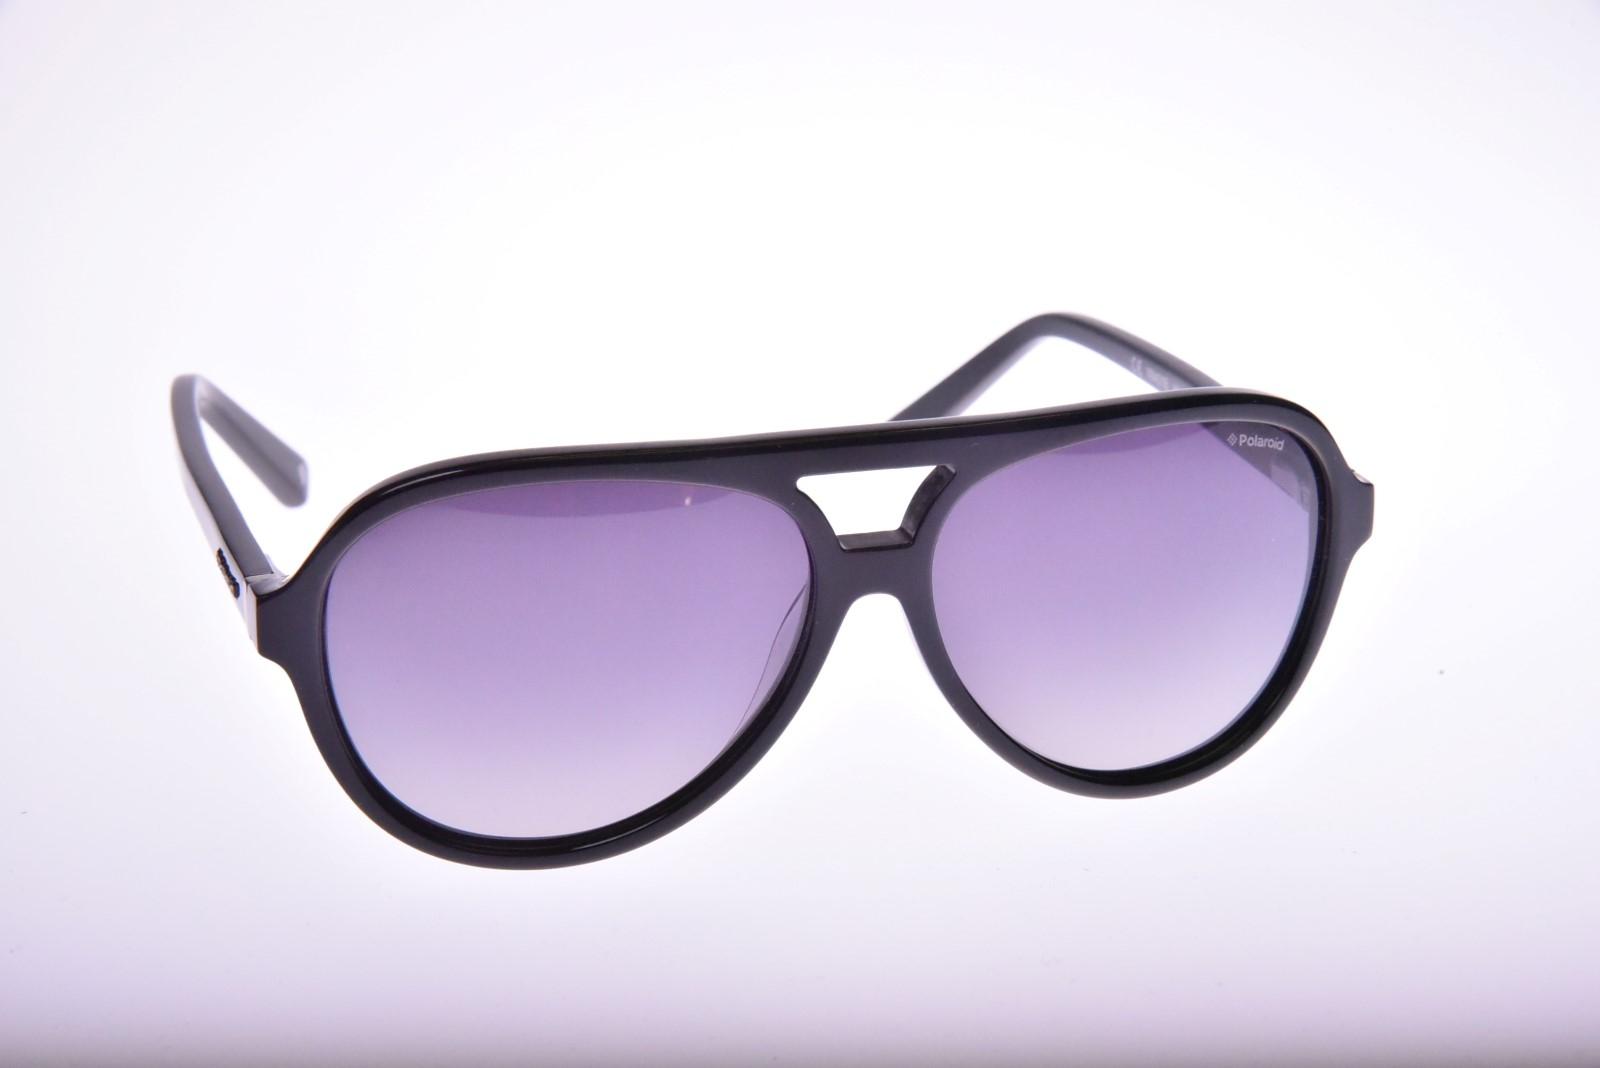 Polaroid Premium X8401C - Dámske slnečné okuliare